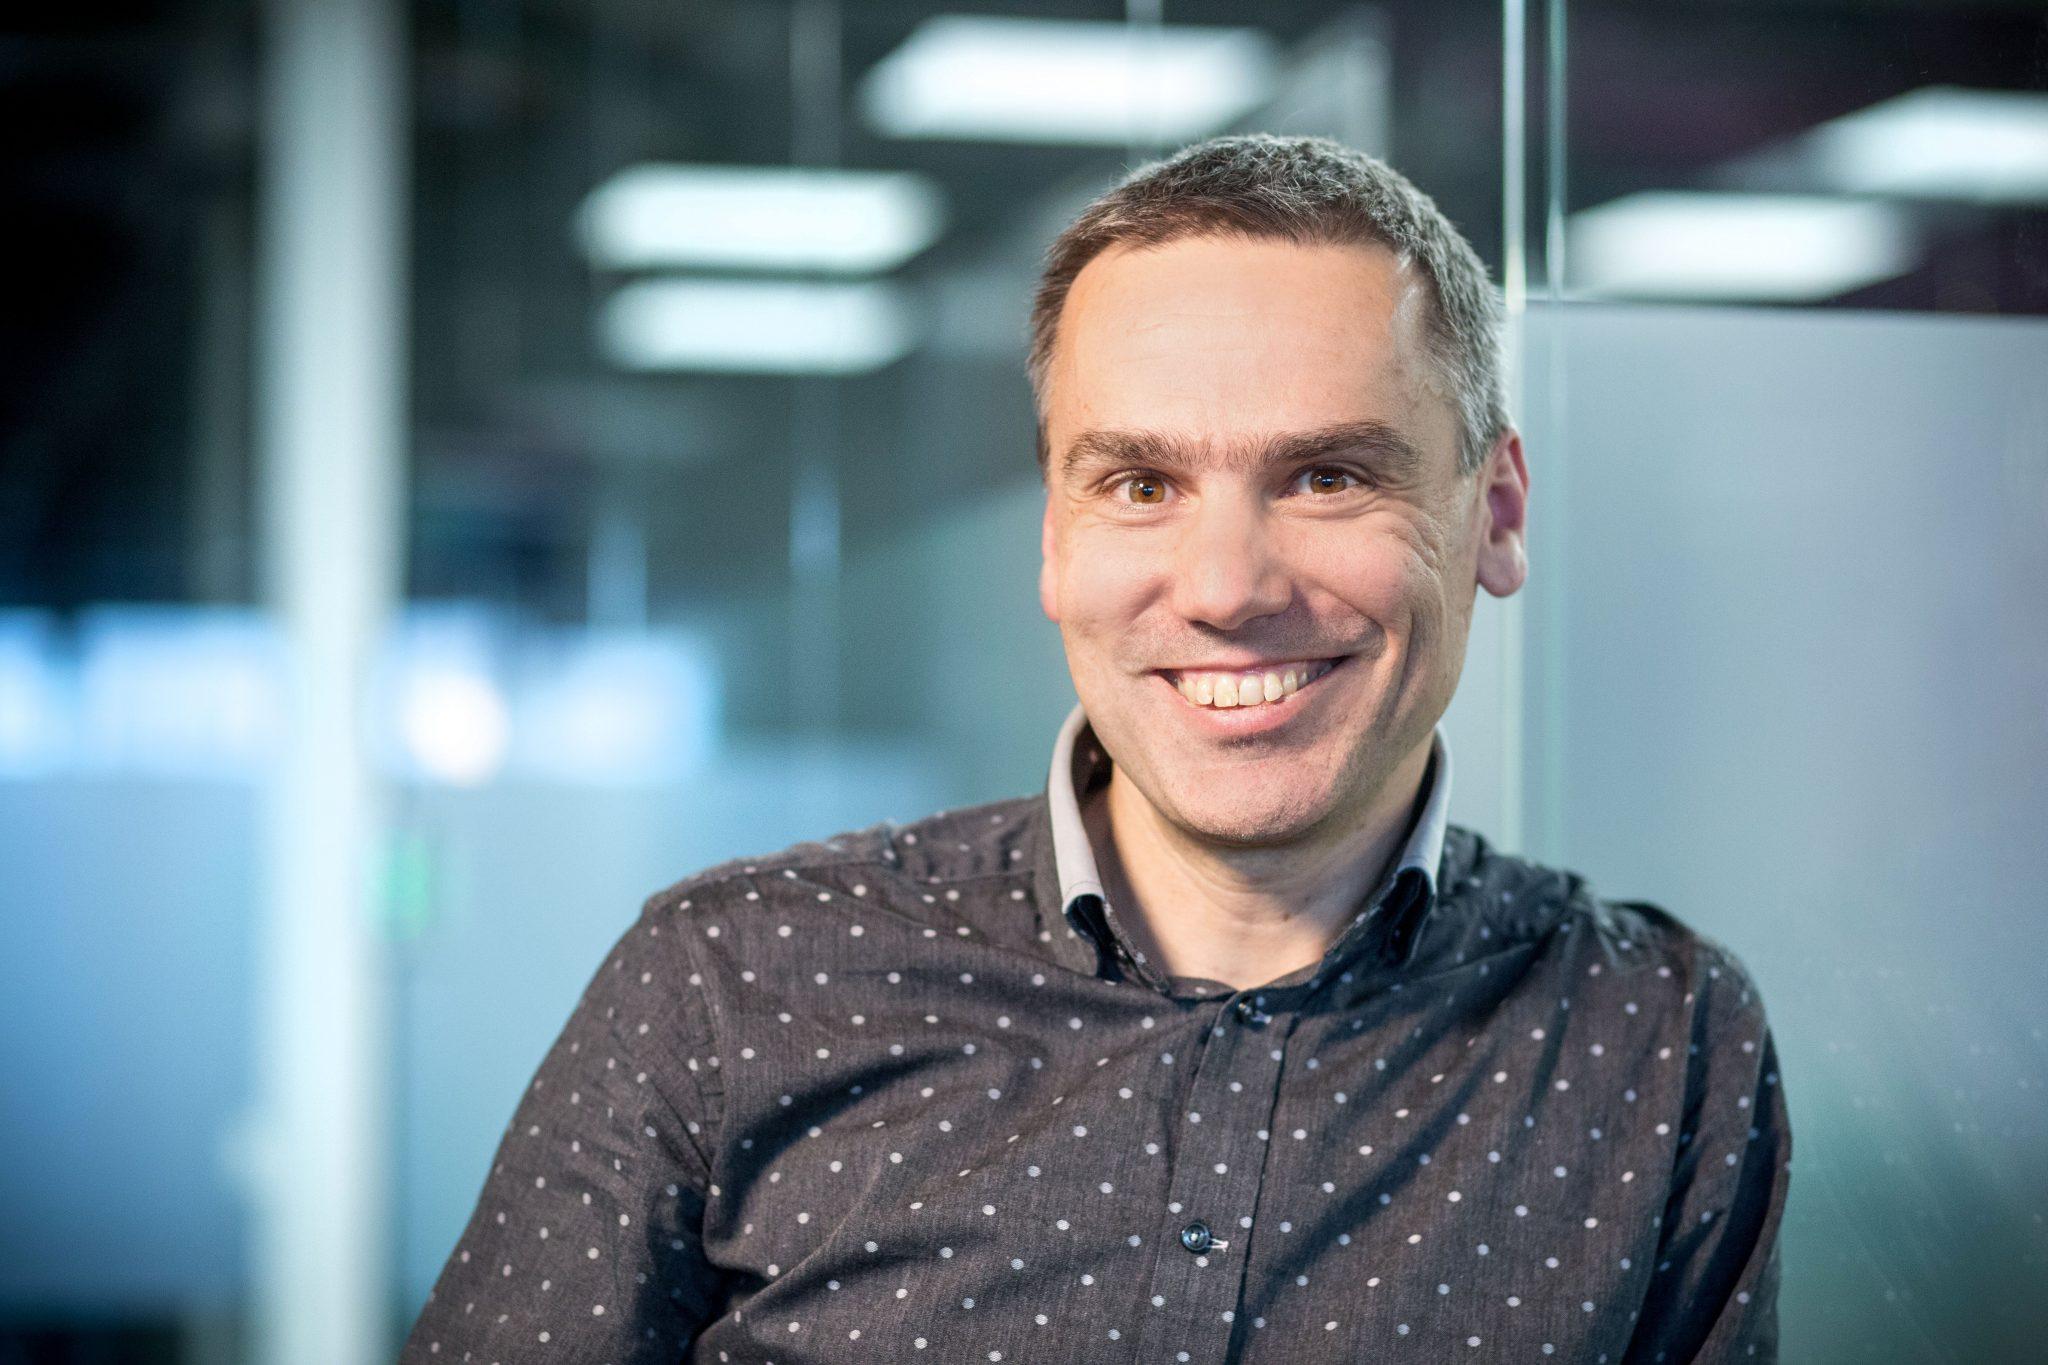 Jan Habermann, cofounder and managing partner at deeptech-focused VC Credo Ventures.